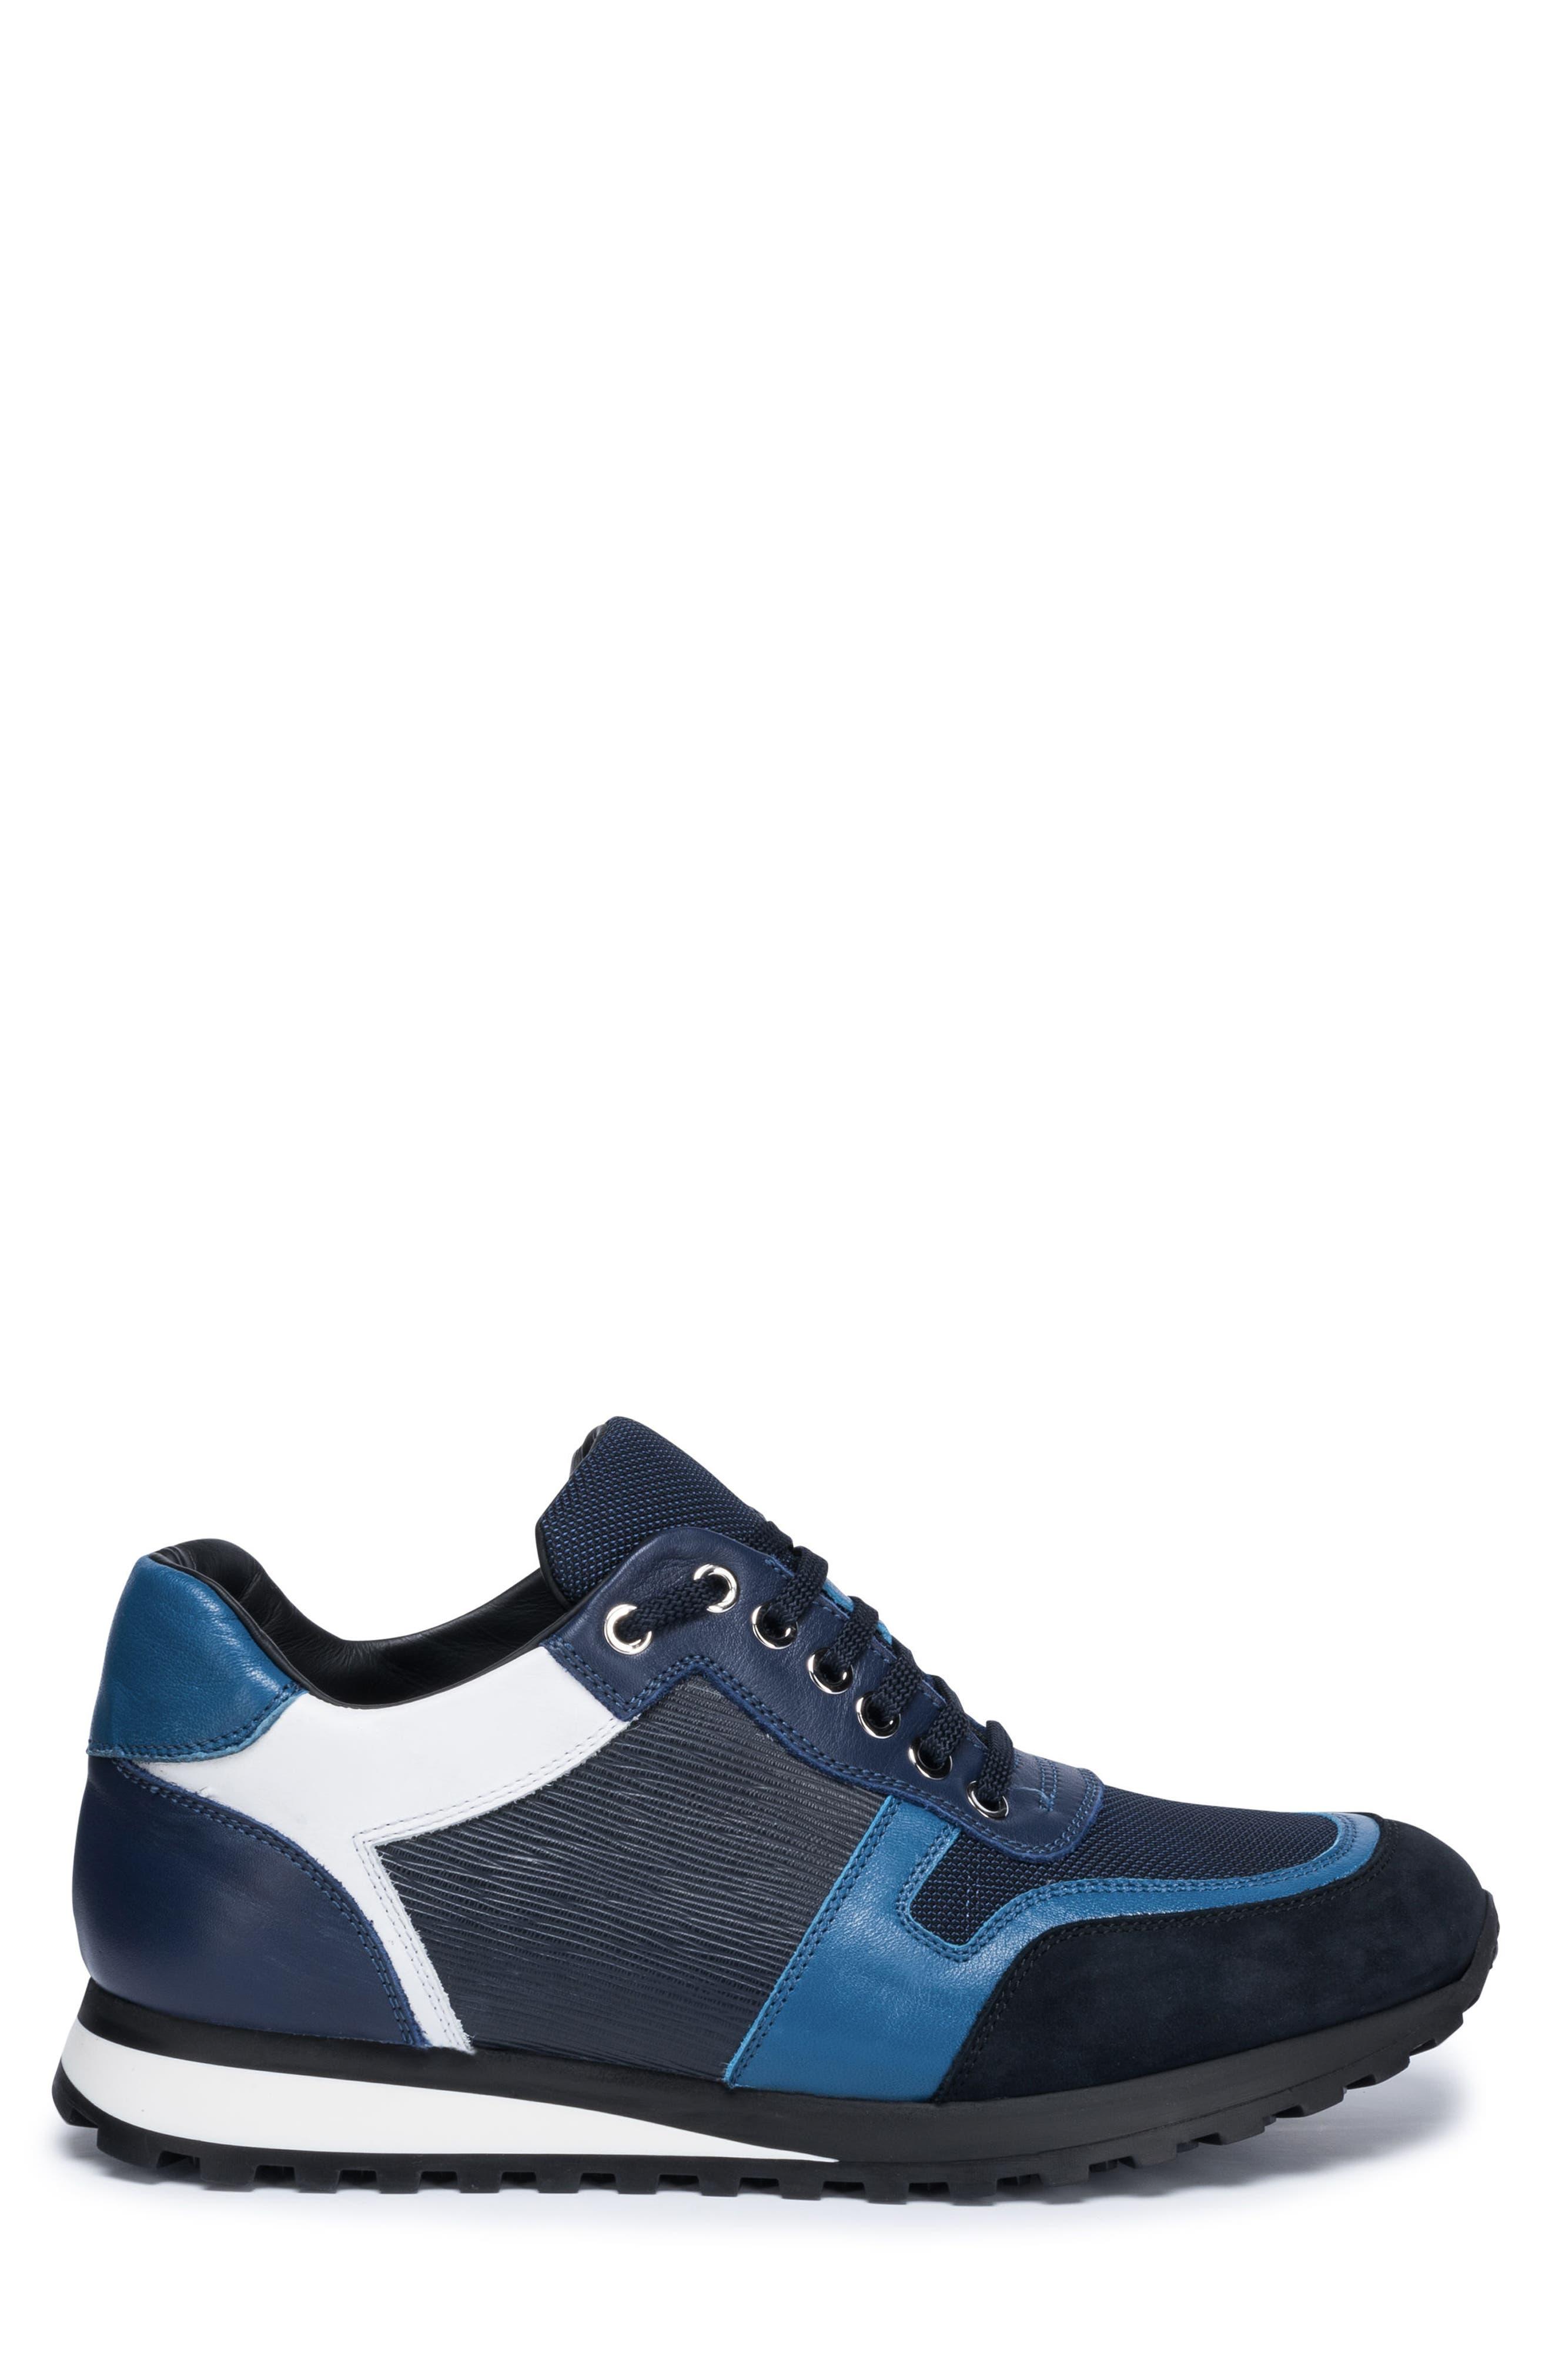 Modena Sneaker,                             Alternate thumbnail 4, color,                             Blue